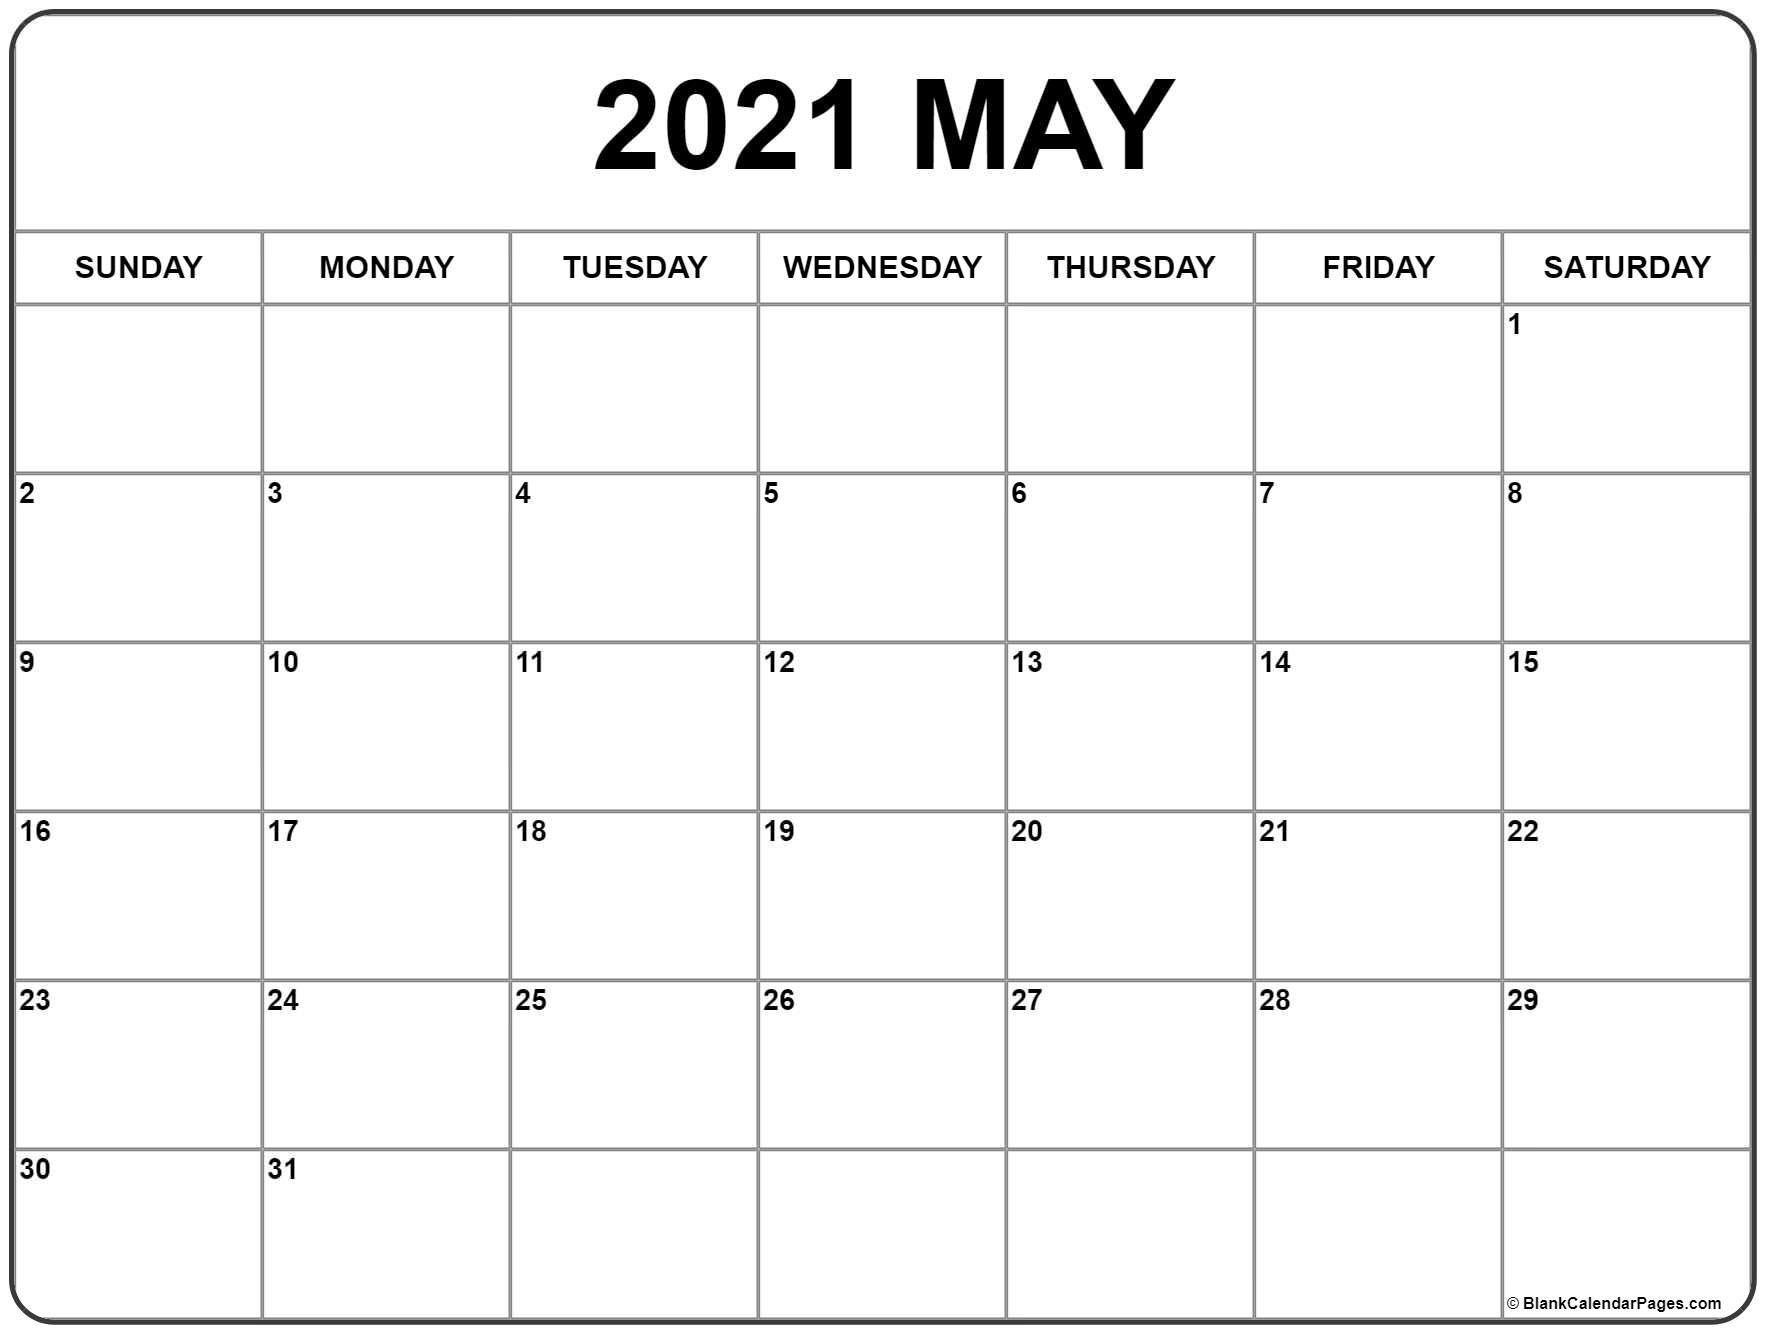 Get Printable Monthly Calendar 2021